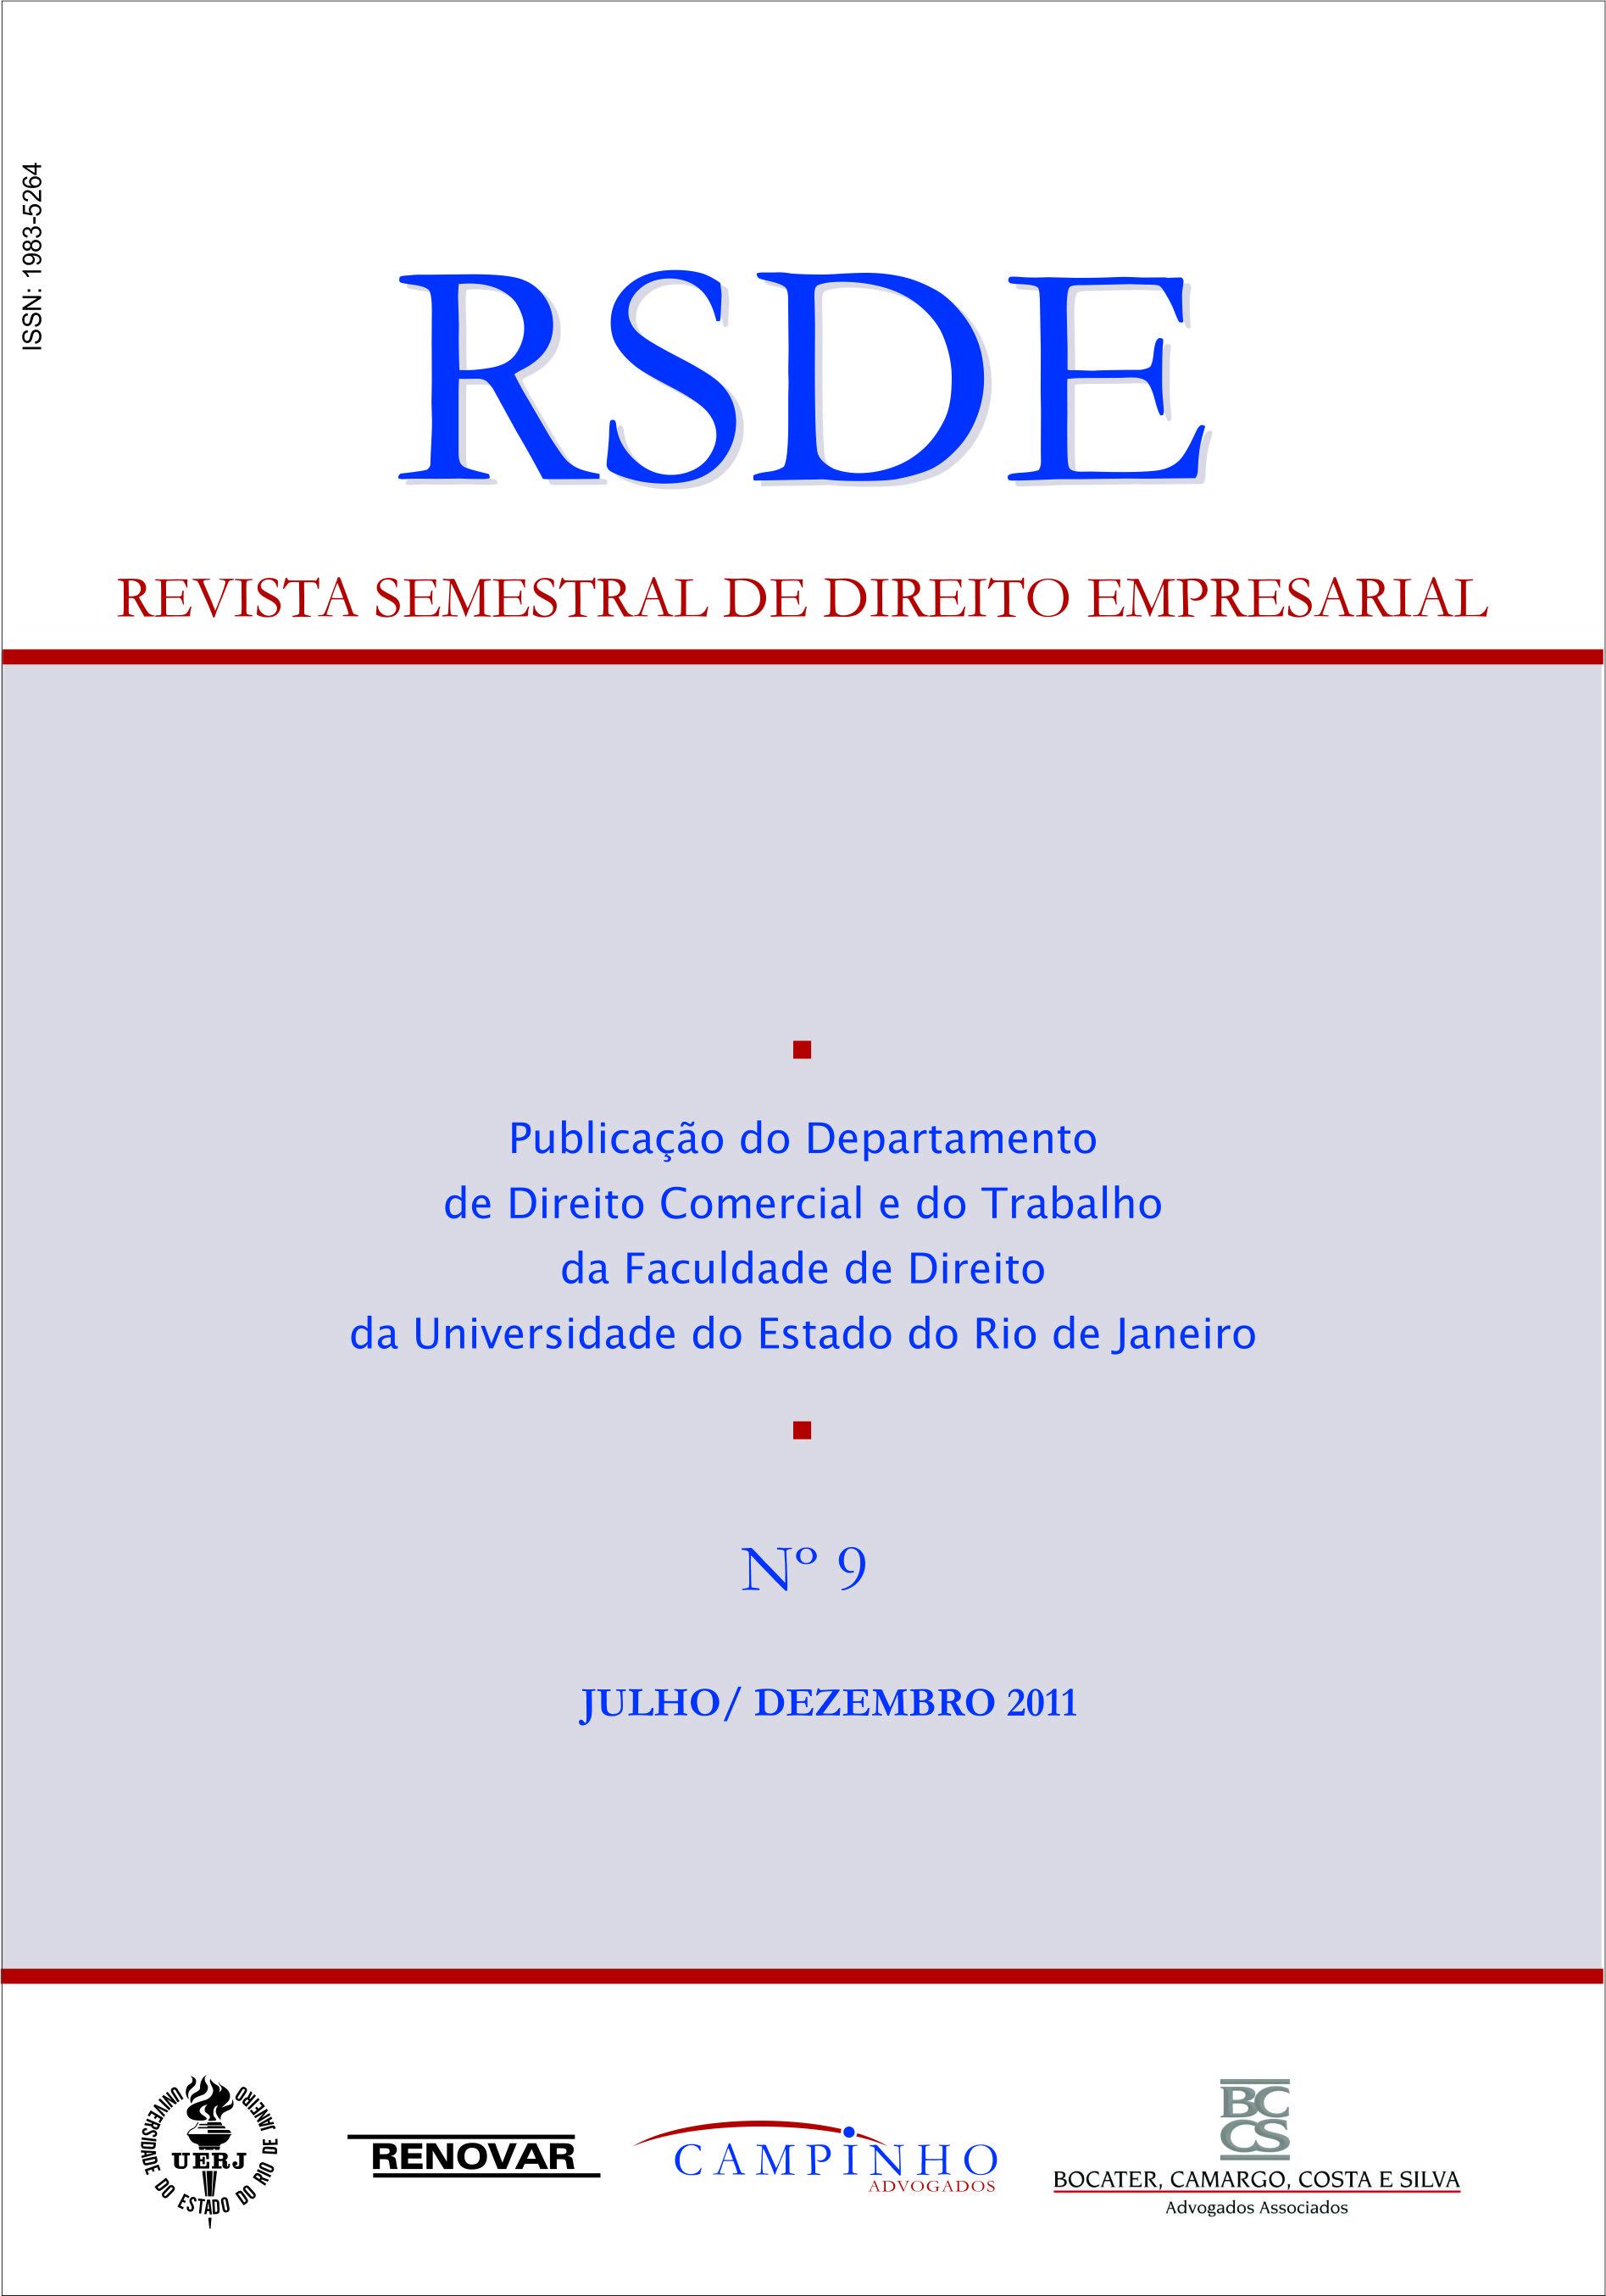 Rsde_-_9